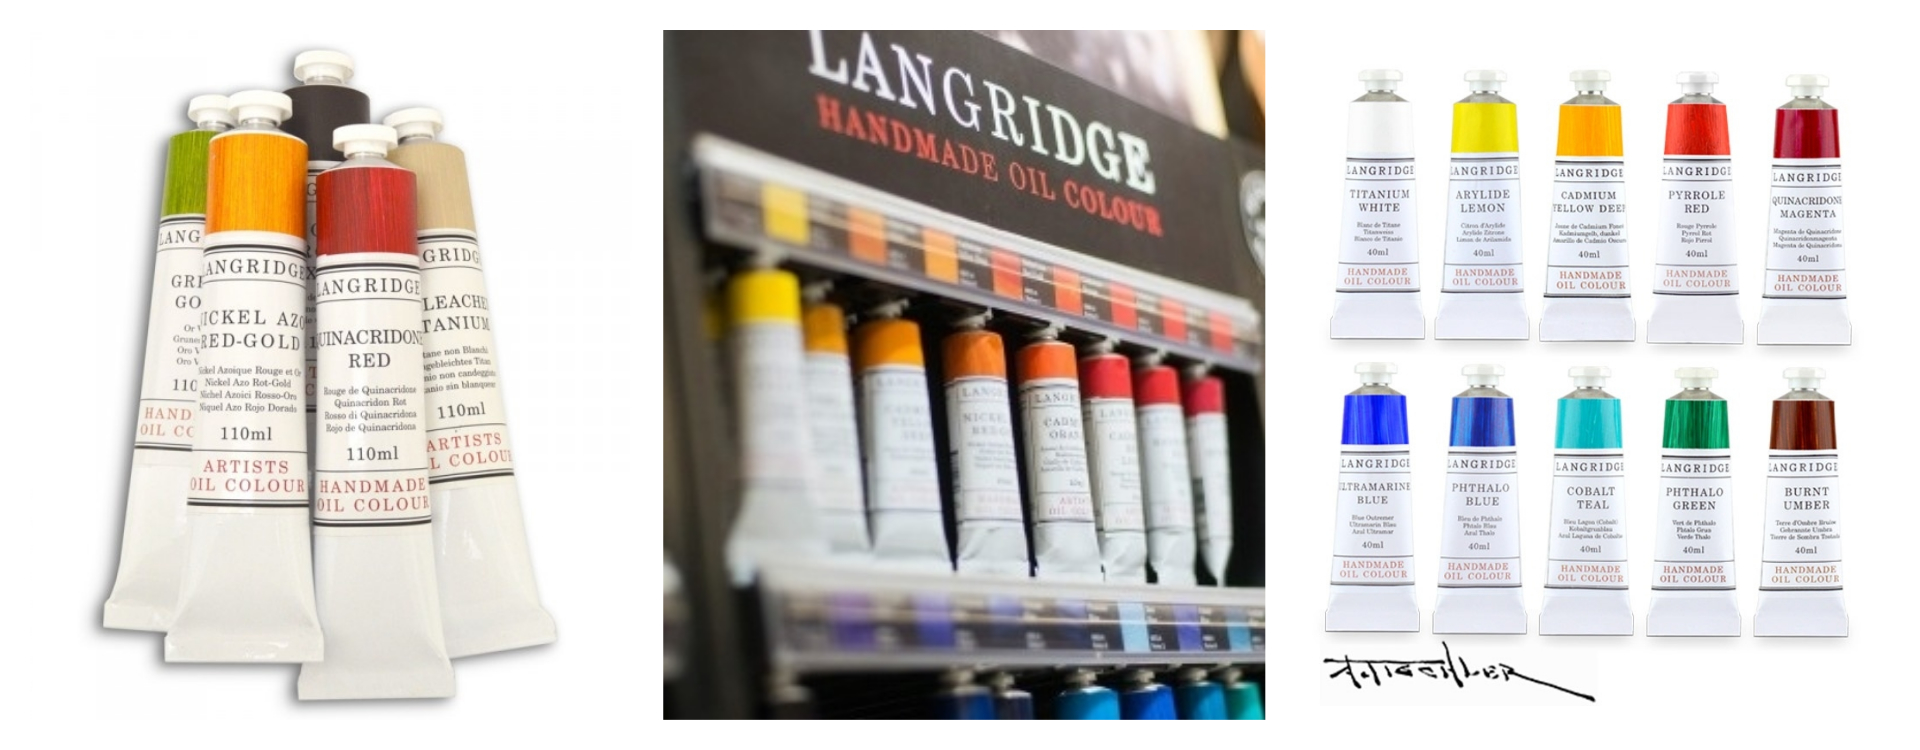 3_LANGRIDGE_OILS.jpg